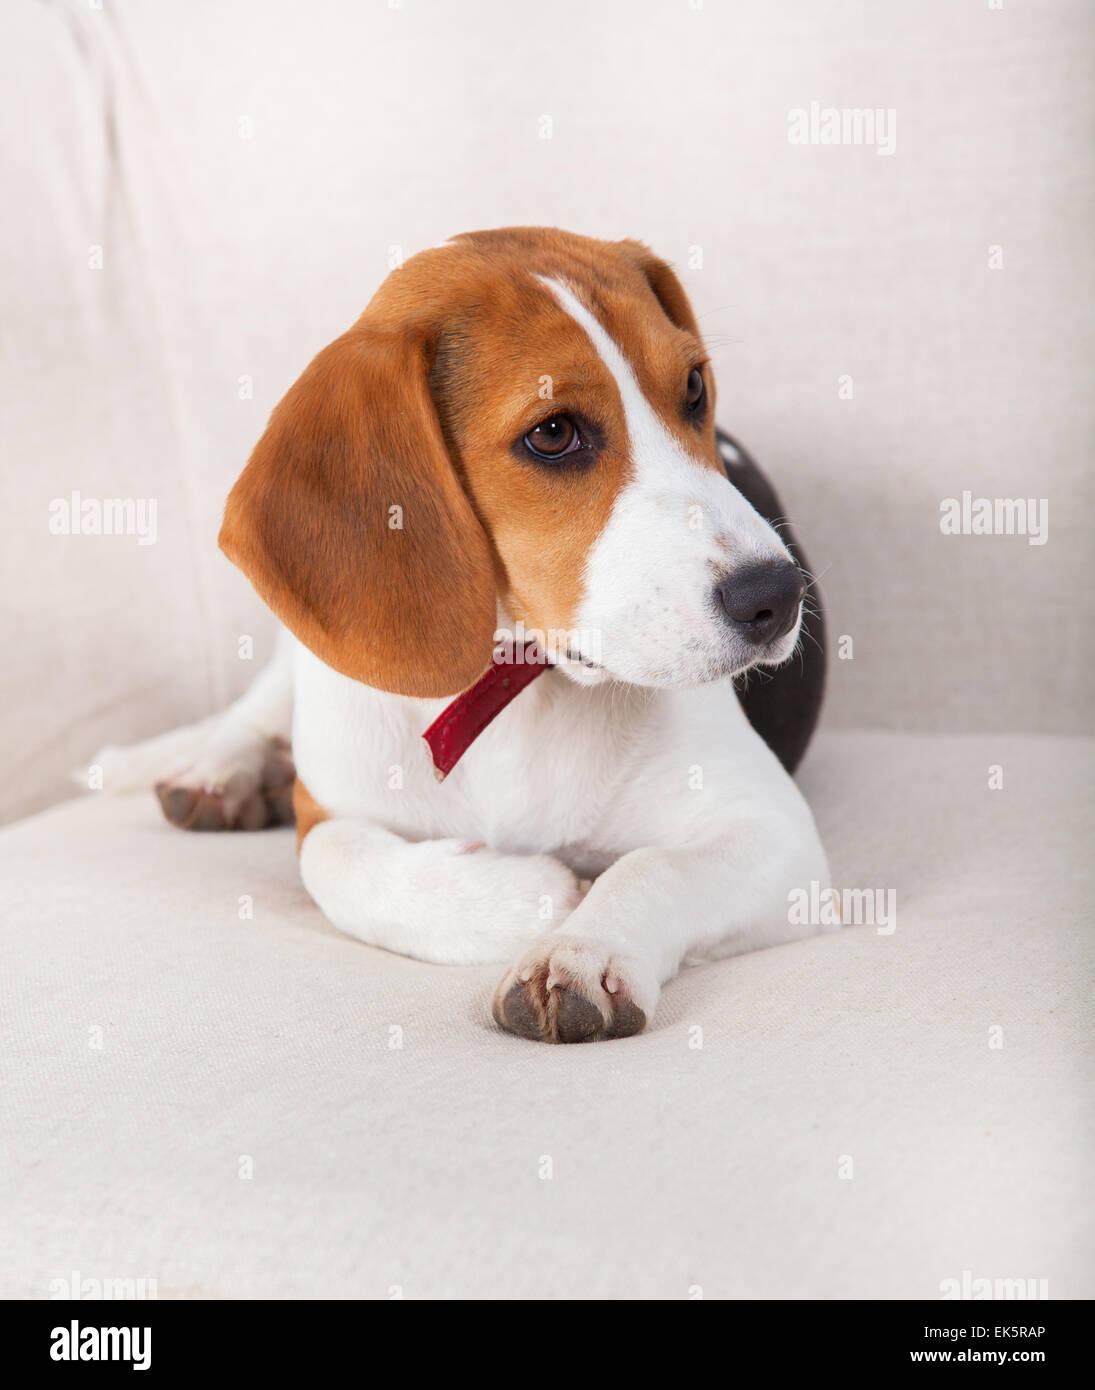 Portrait of a beagle dog sitting on the sofa. - Stock Image